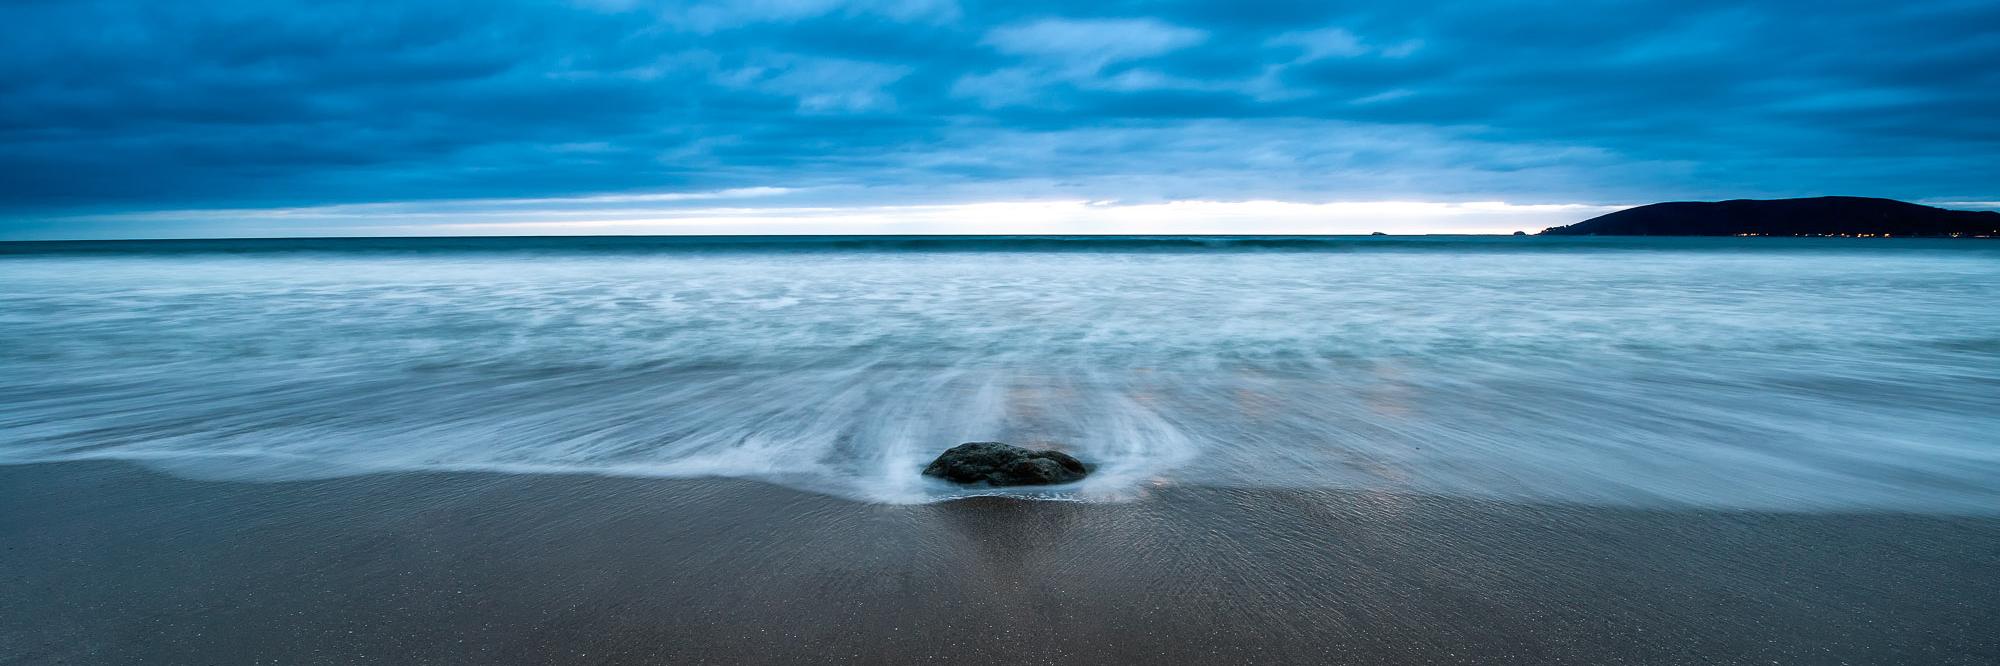 20130305_Shell Beach_3986_Edit.jpg